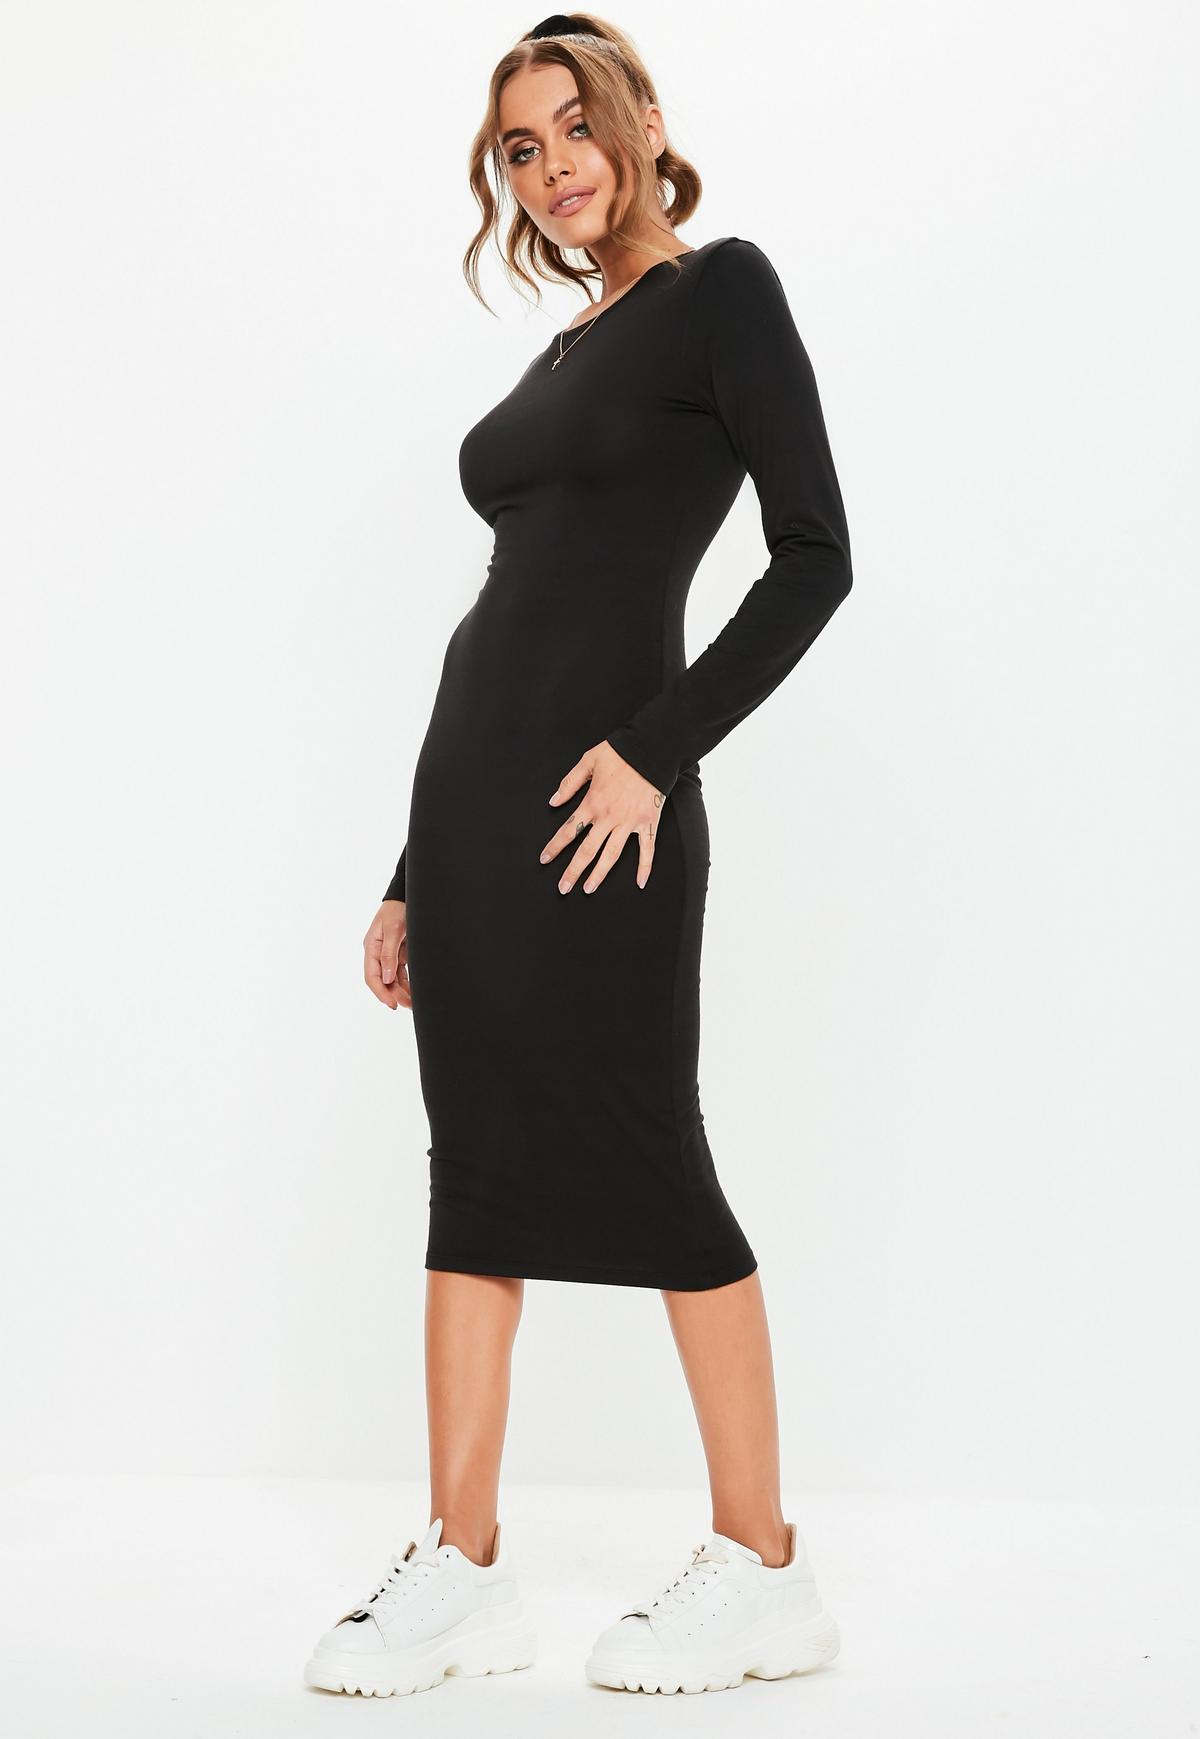 Black long sleeve bodycon dress x ray